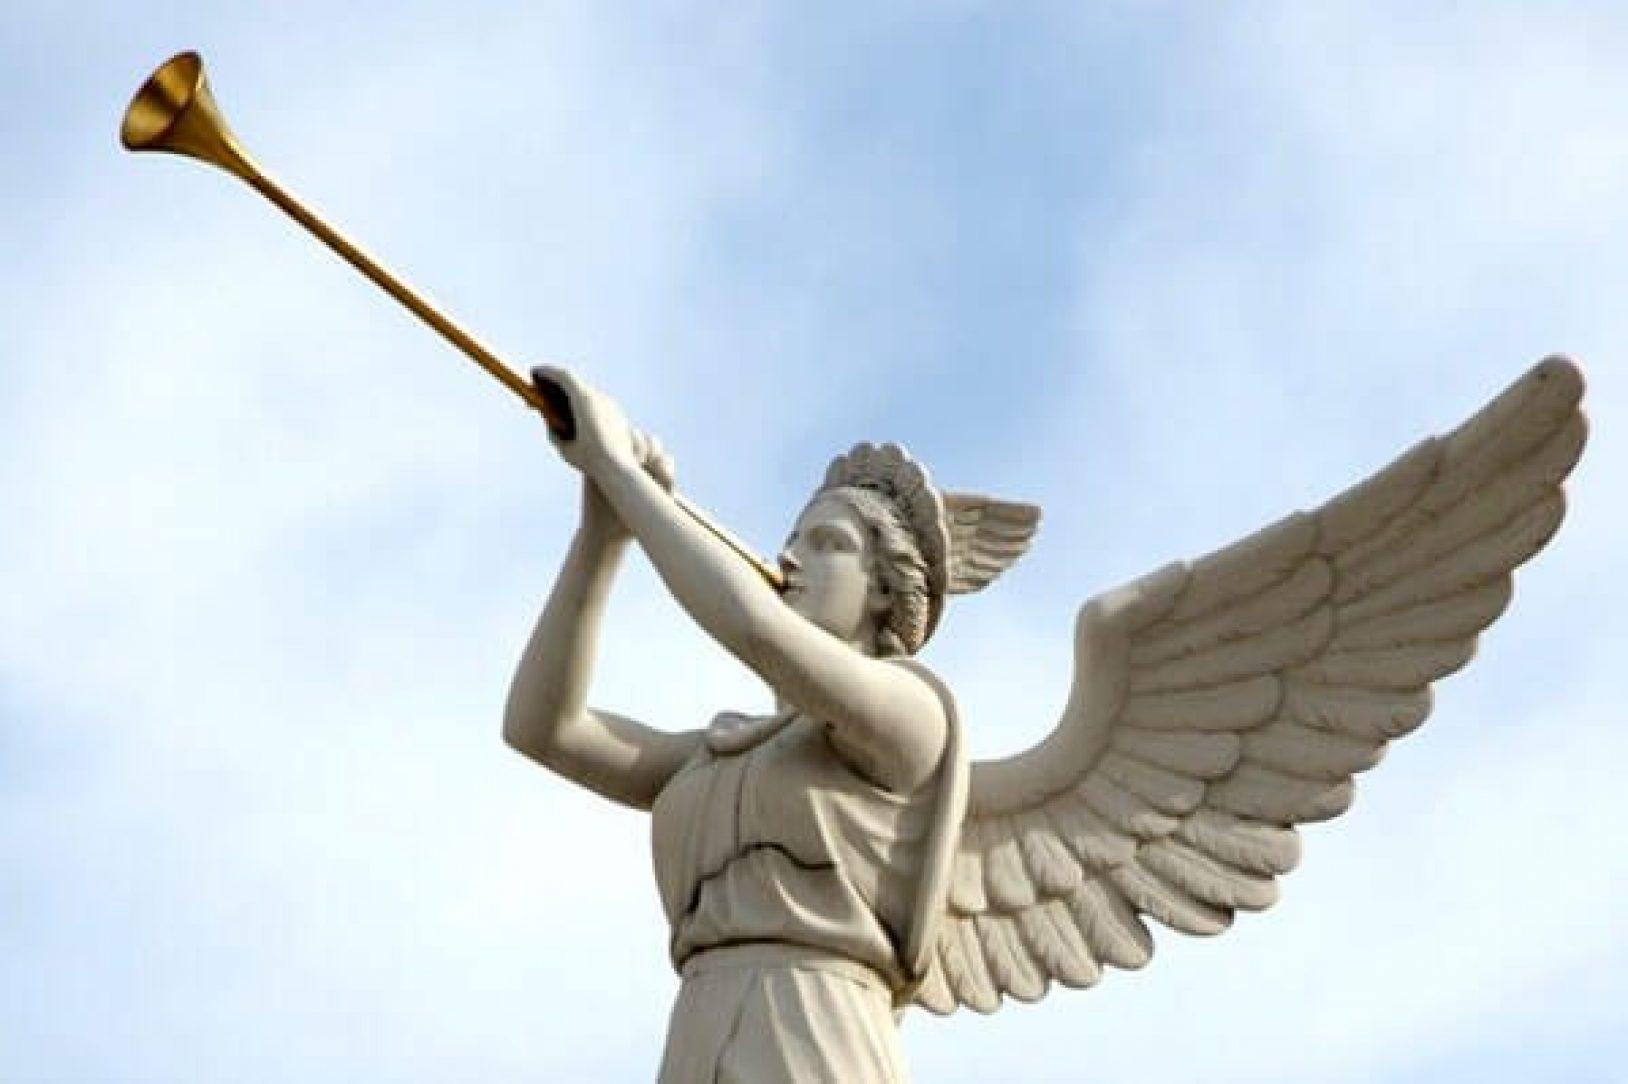 картинки трубящий ангел павлович честью продолжил